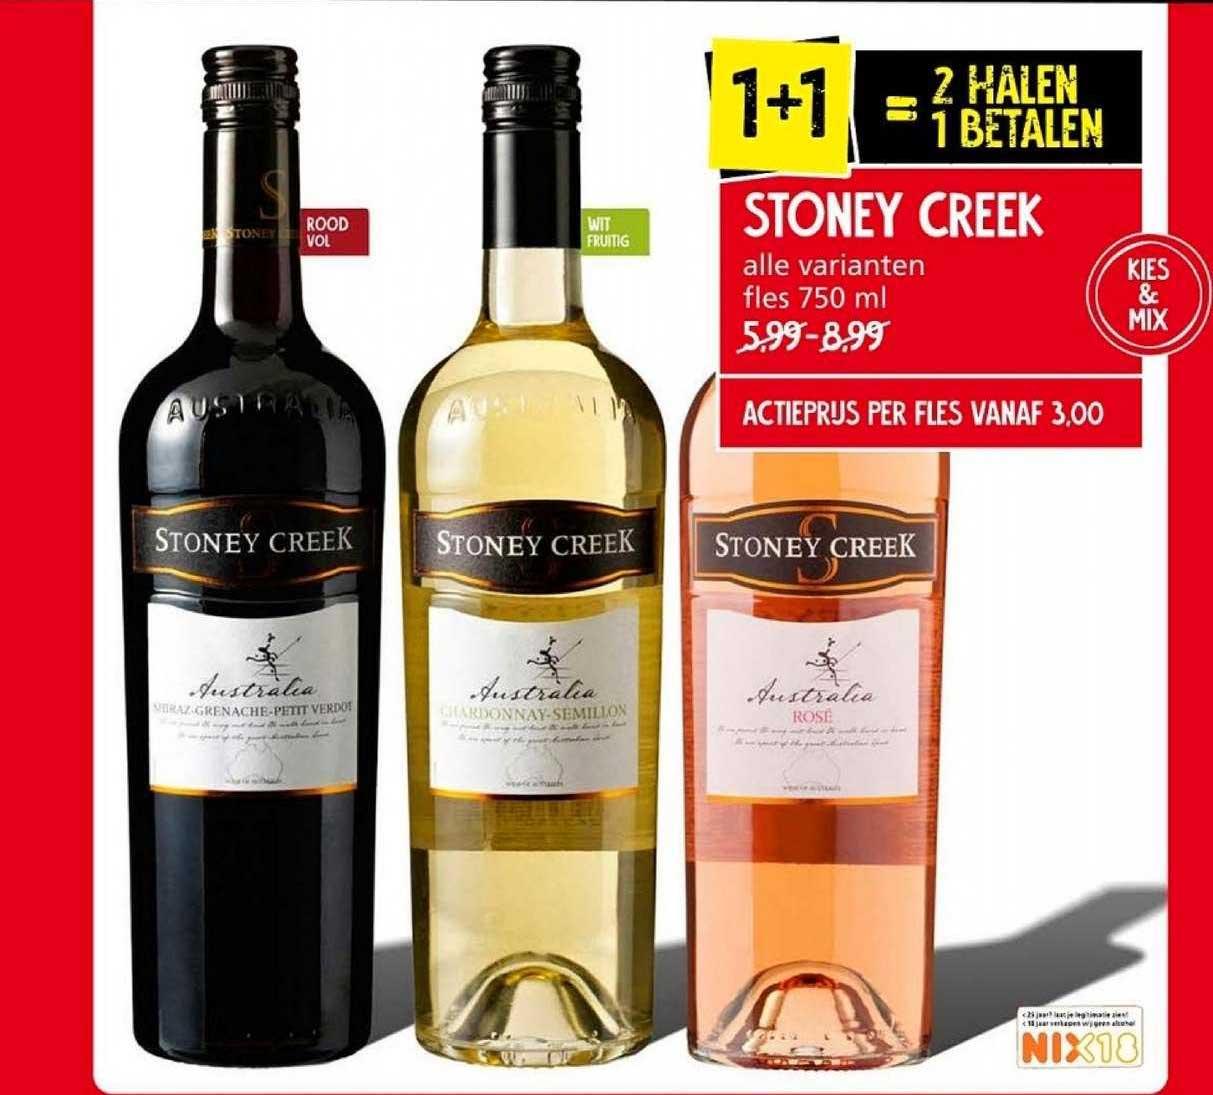 Jan Linders Stoney Creek 1+1 Gratis